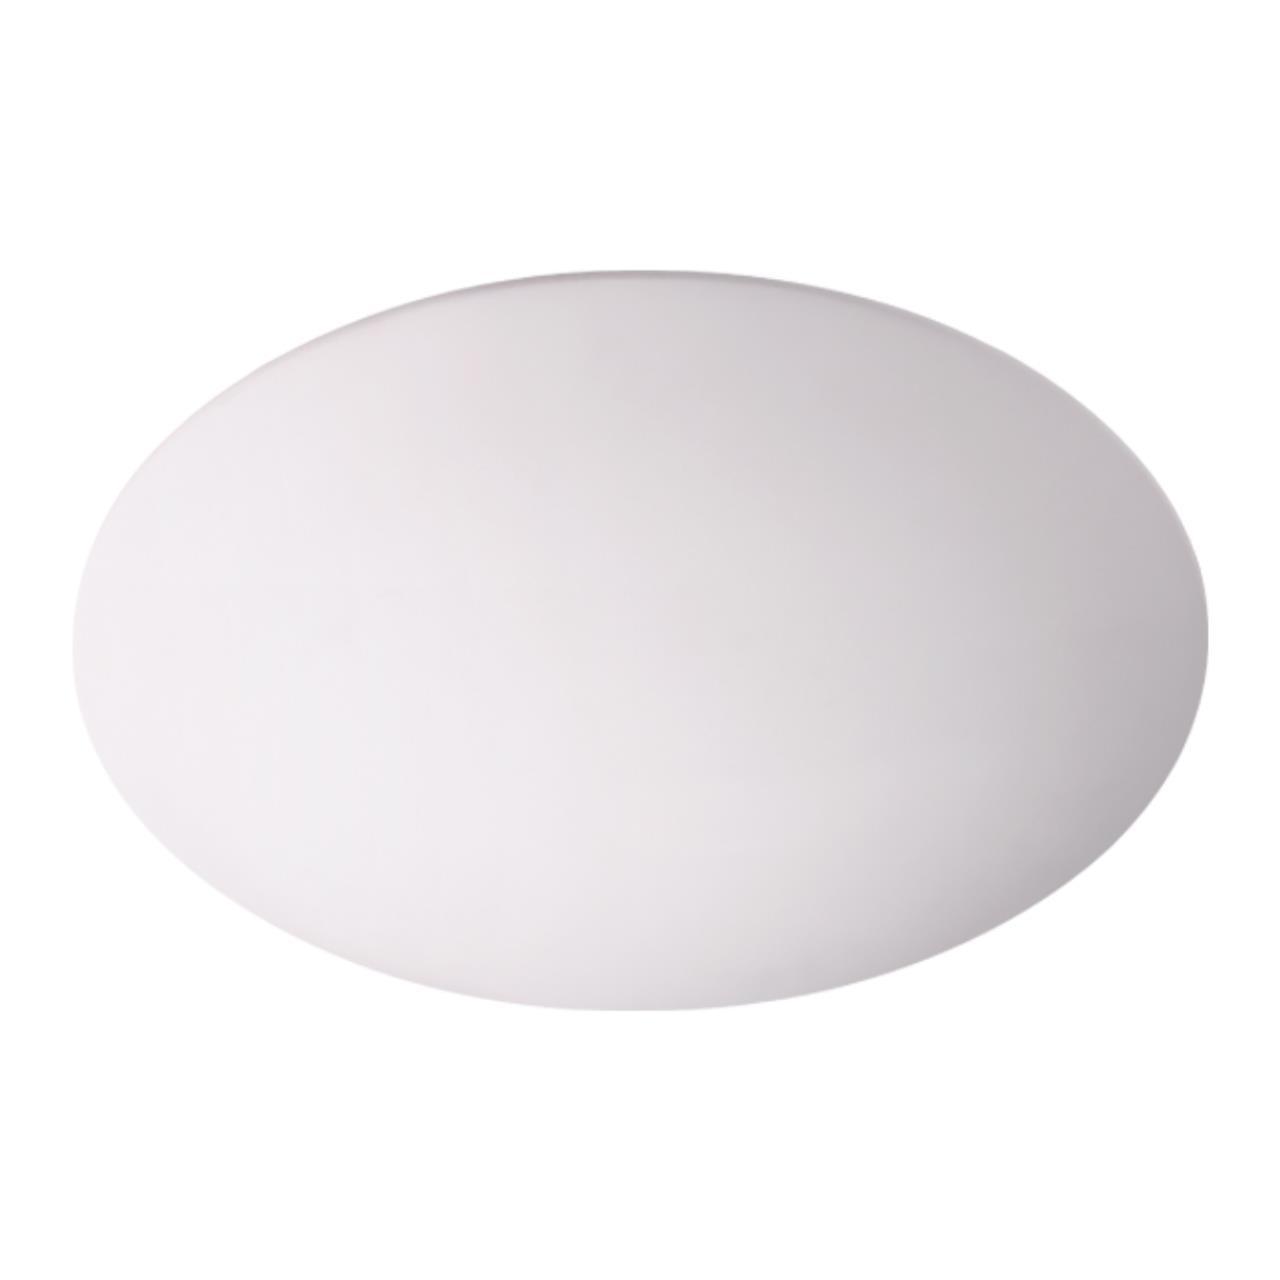 357928 OVER NT19 040 белый Накладной светильник IP20 LED 3000К 7W 220V CAIL